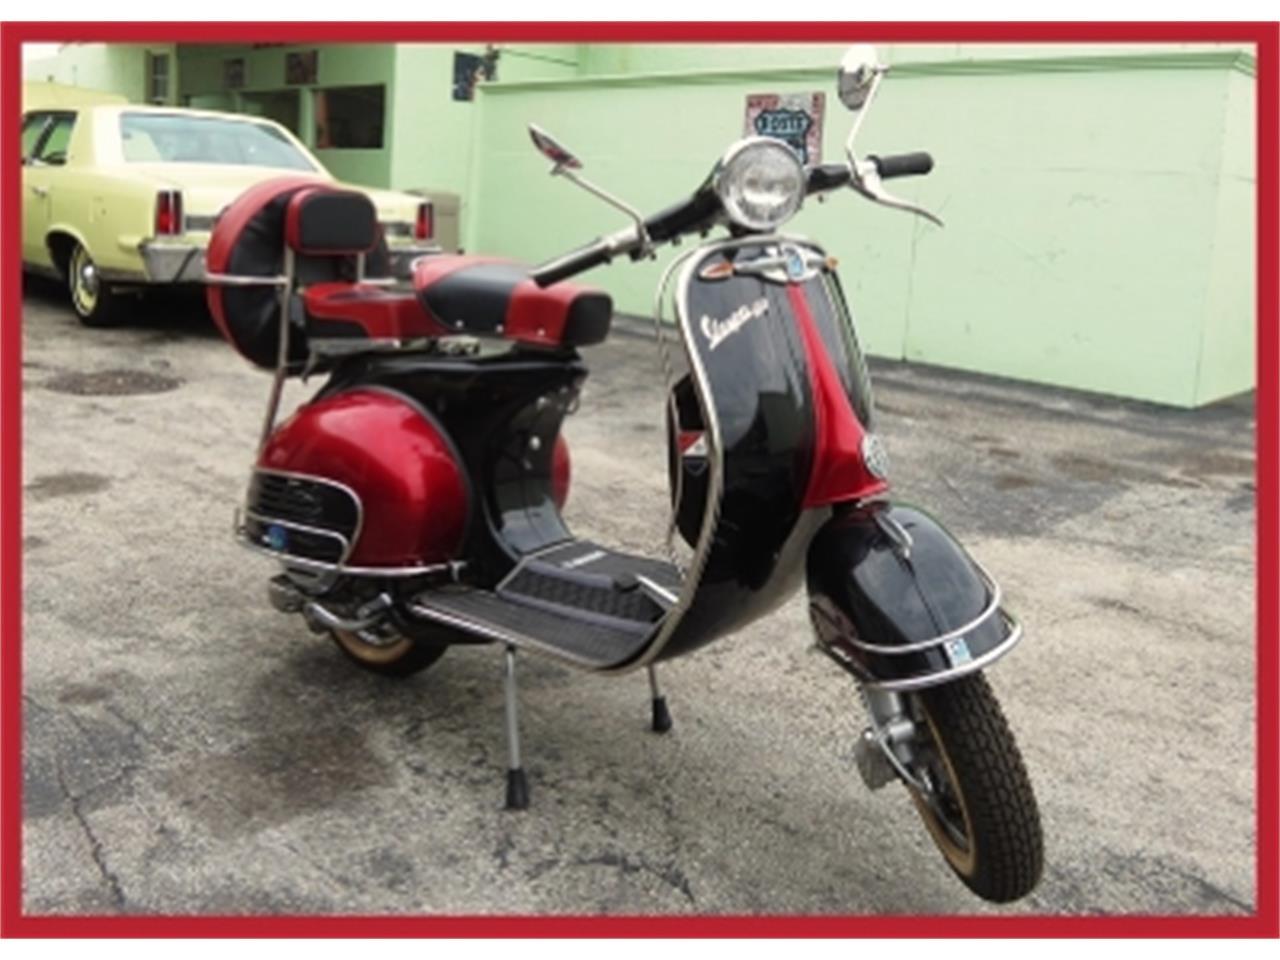 1966 Vespa Scooter For Sale Classiccars Com Cc 666010